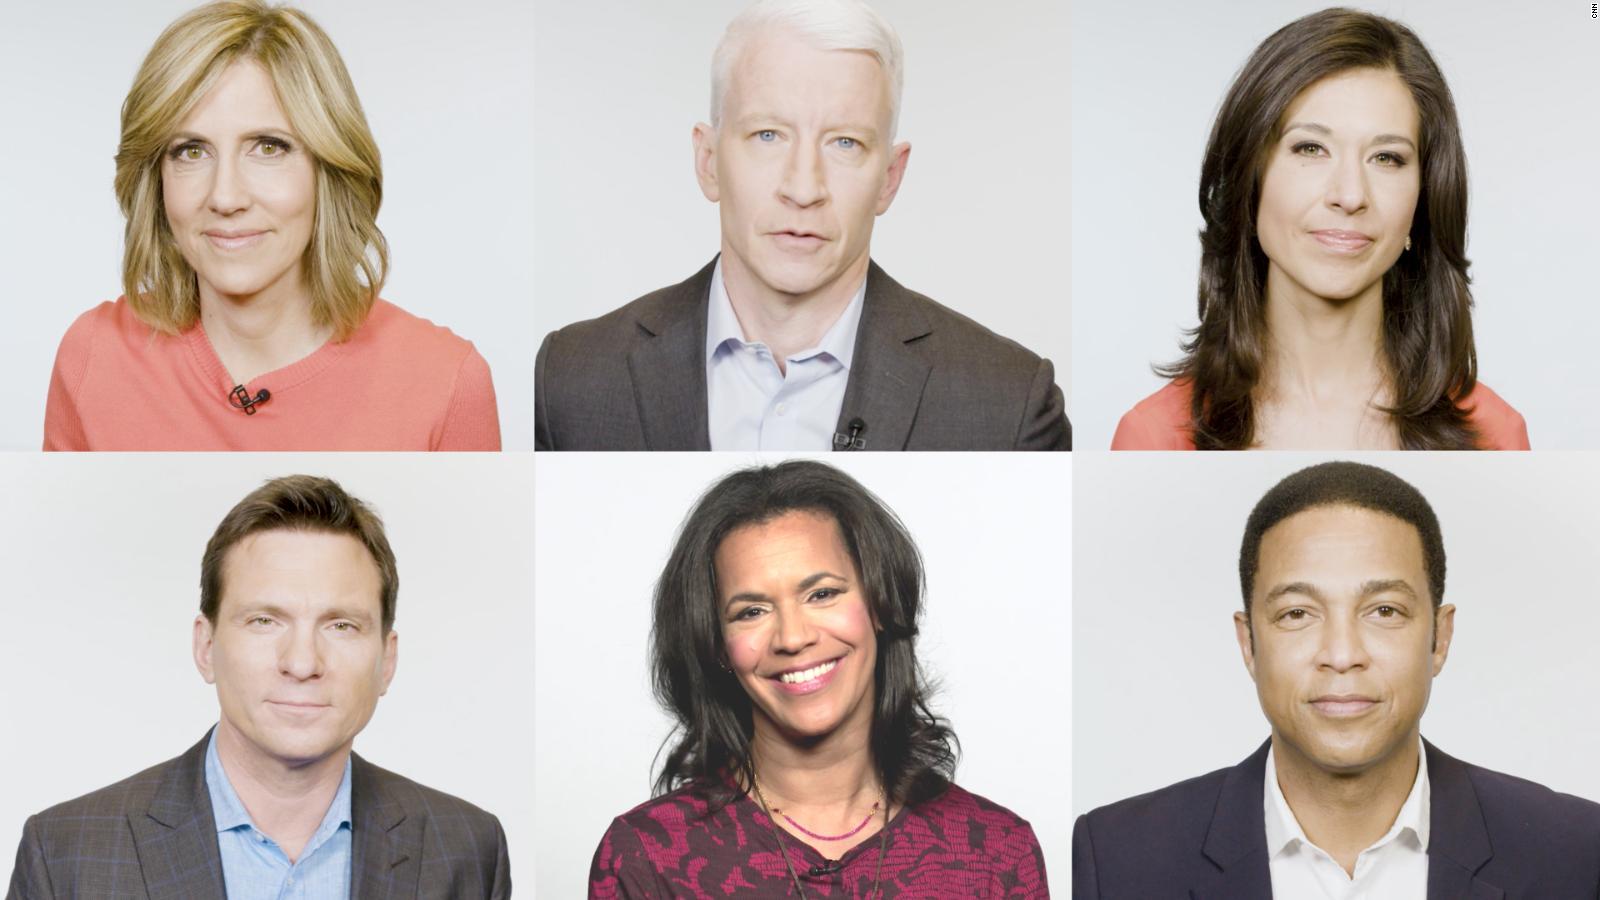 CNN anchors explain how to disrupt status quo